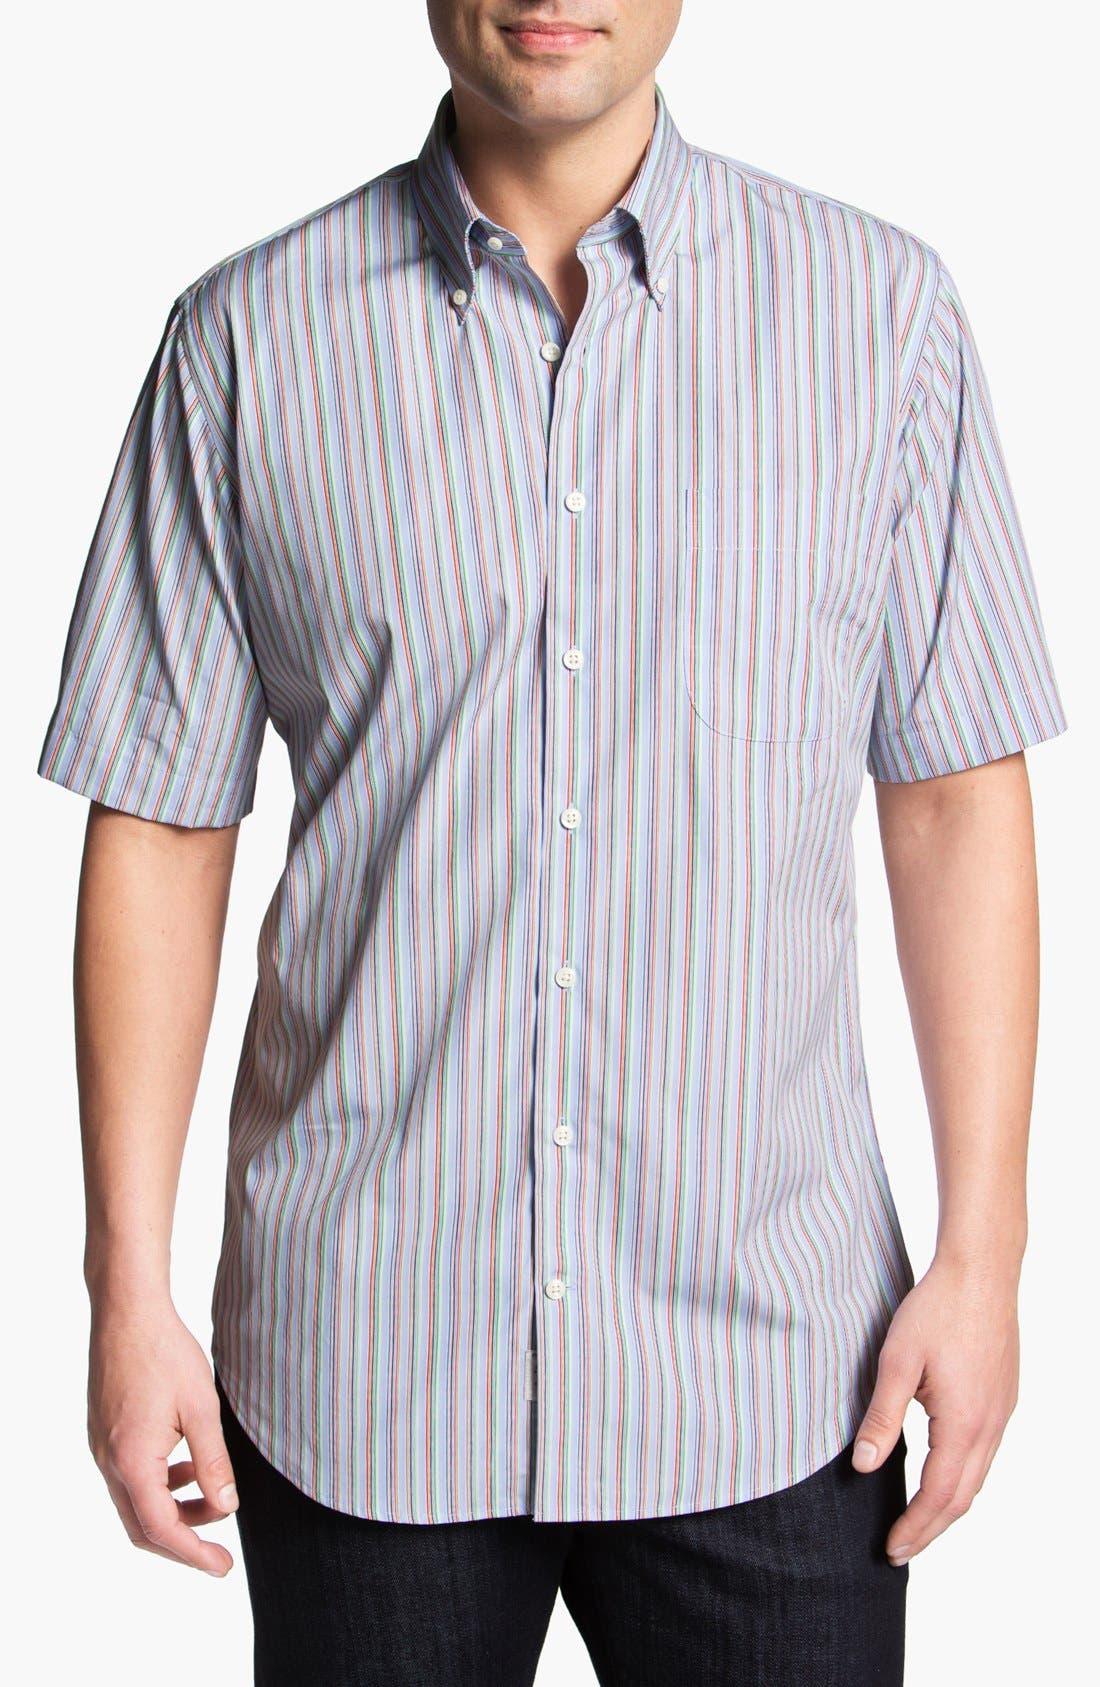 Main Image - Peter Millar 'Pop' Regular Fit Short Sleeve Sport Shirt